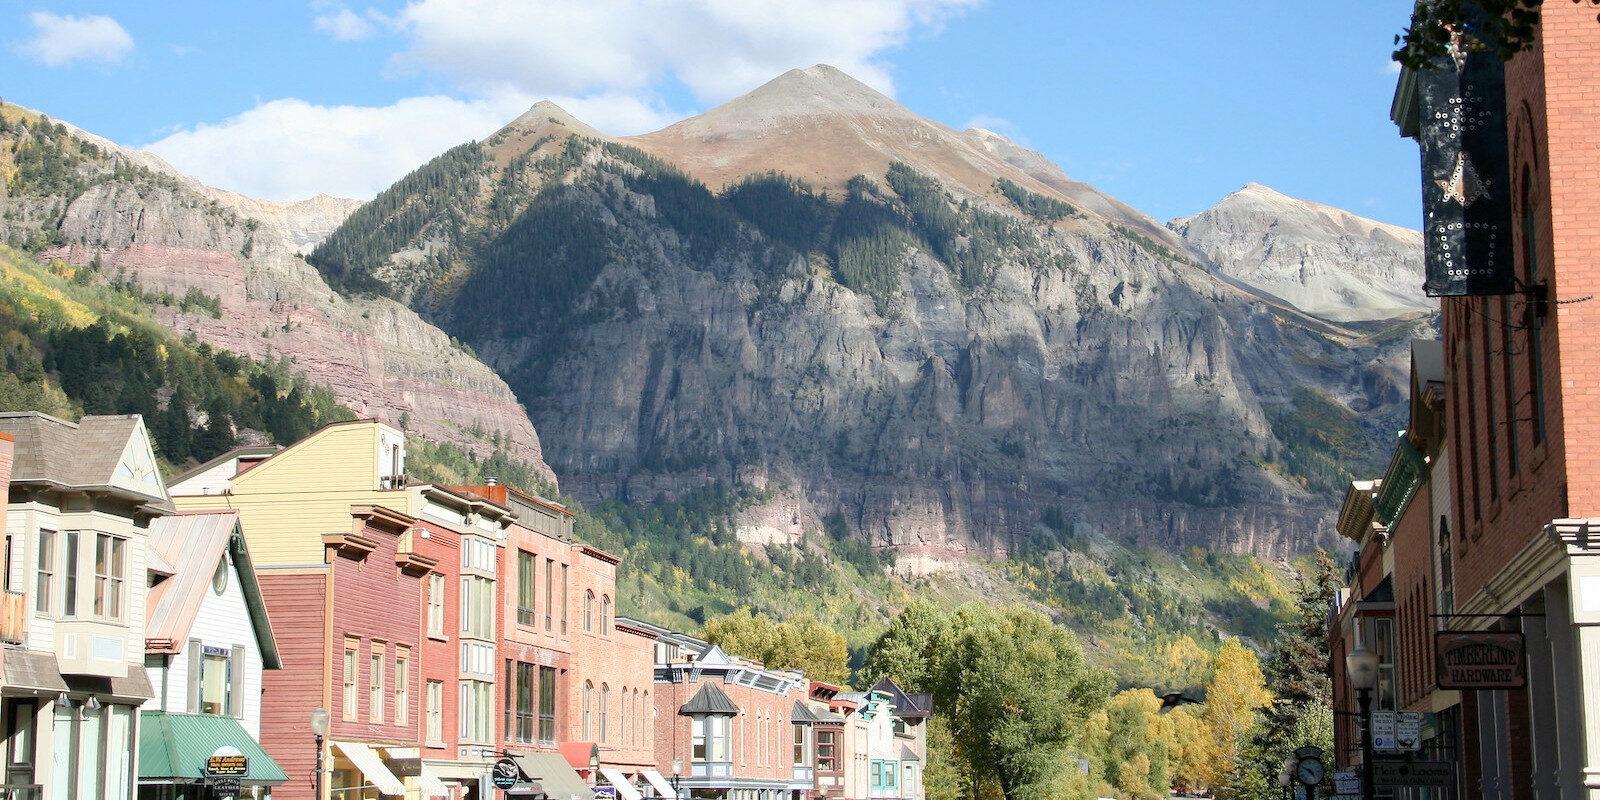 Image of Telluride, Colorado